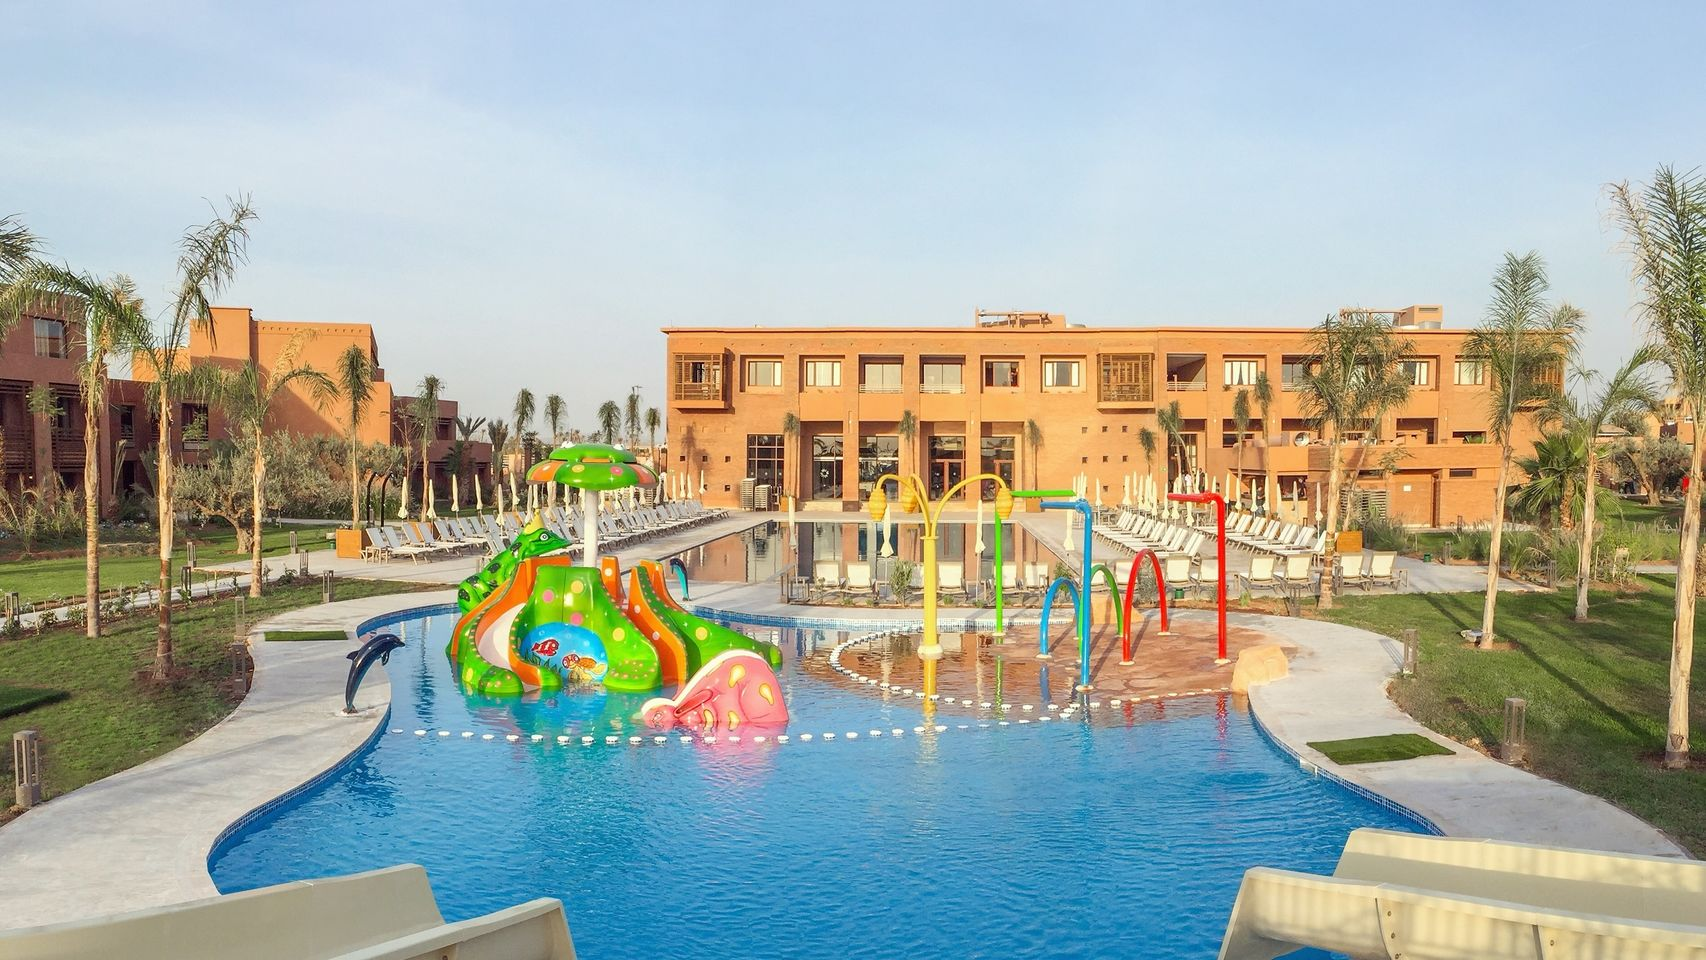 Hoteles-Marruecos-Globalia-Empresas_271485448_58510621_1706x960